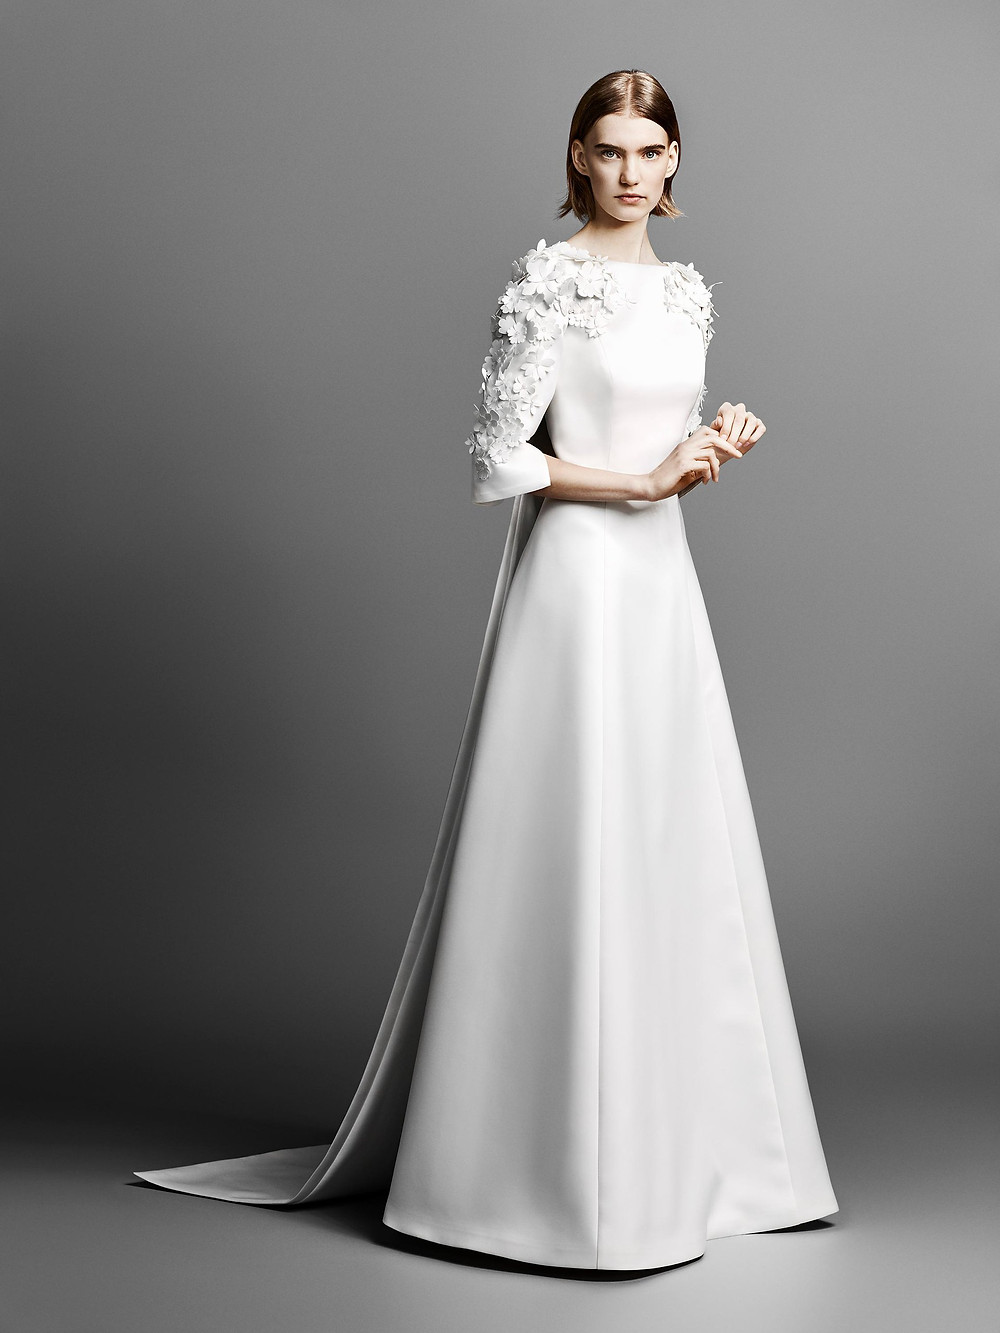 A Viktor & Rolf modest 3/4 sleeve, A-line wedding dress with flowers